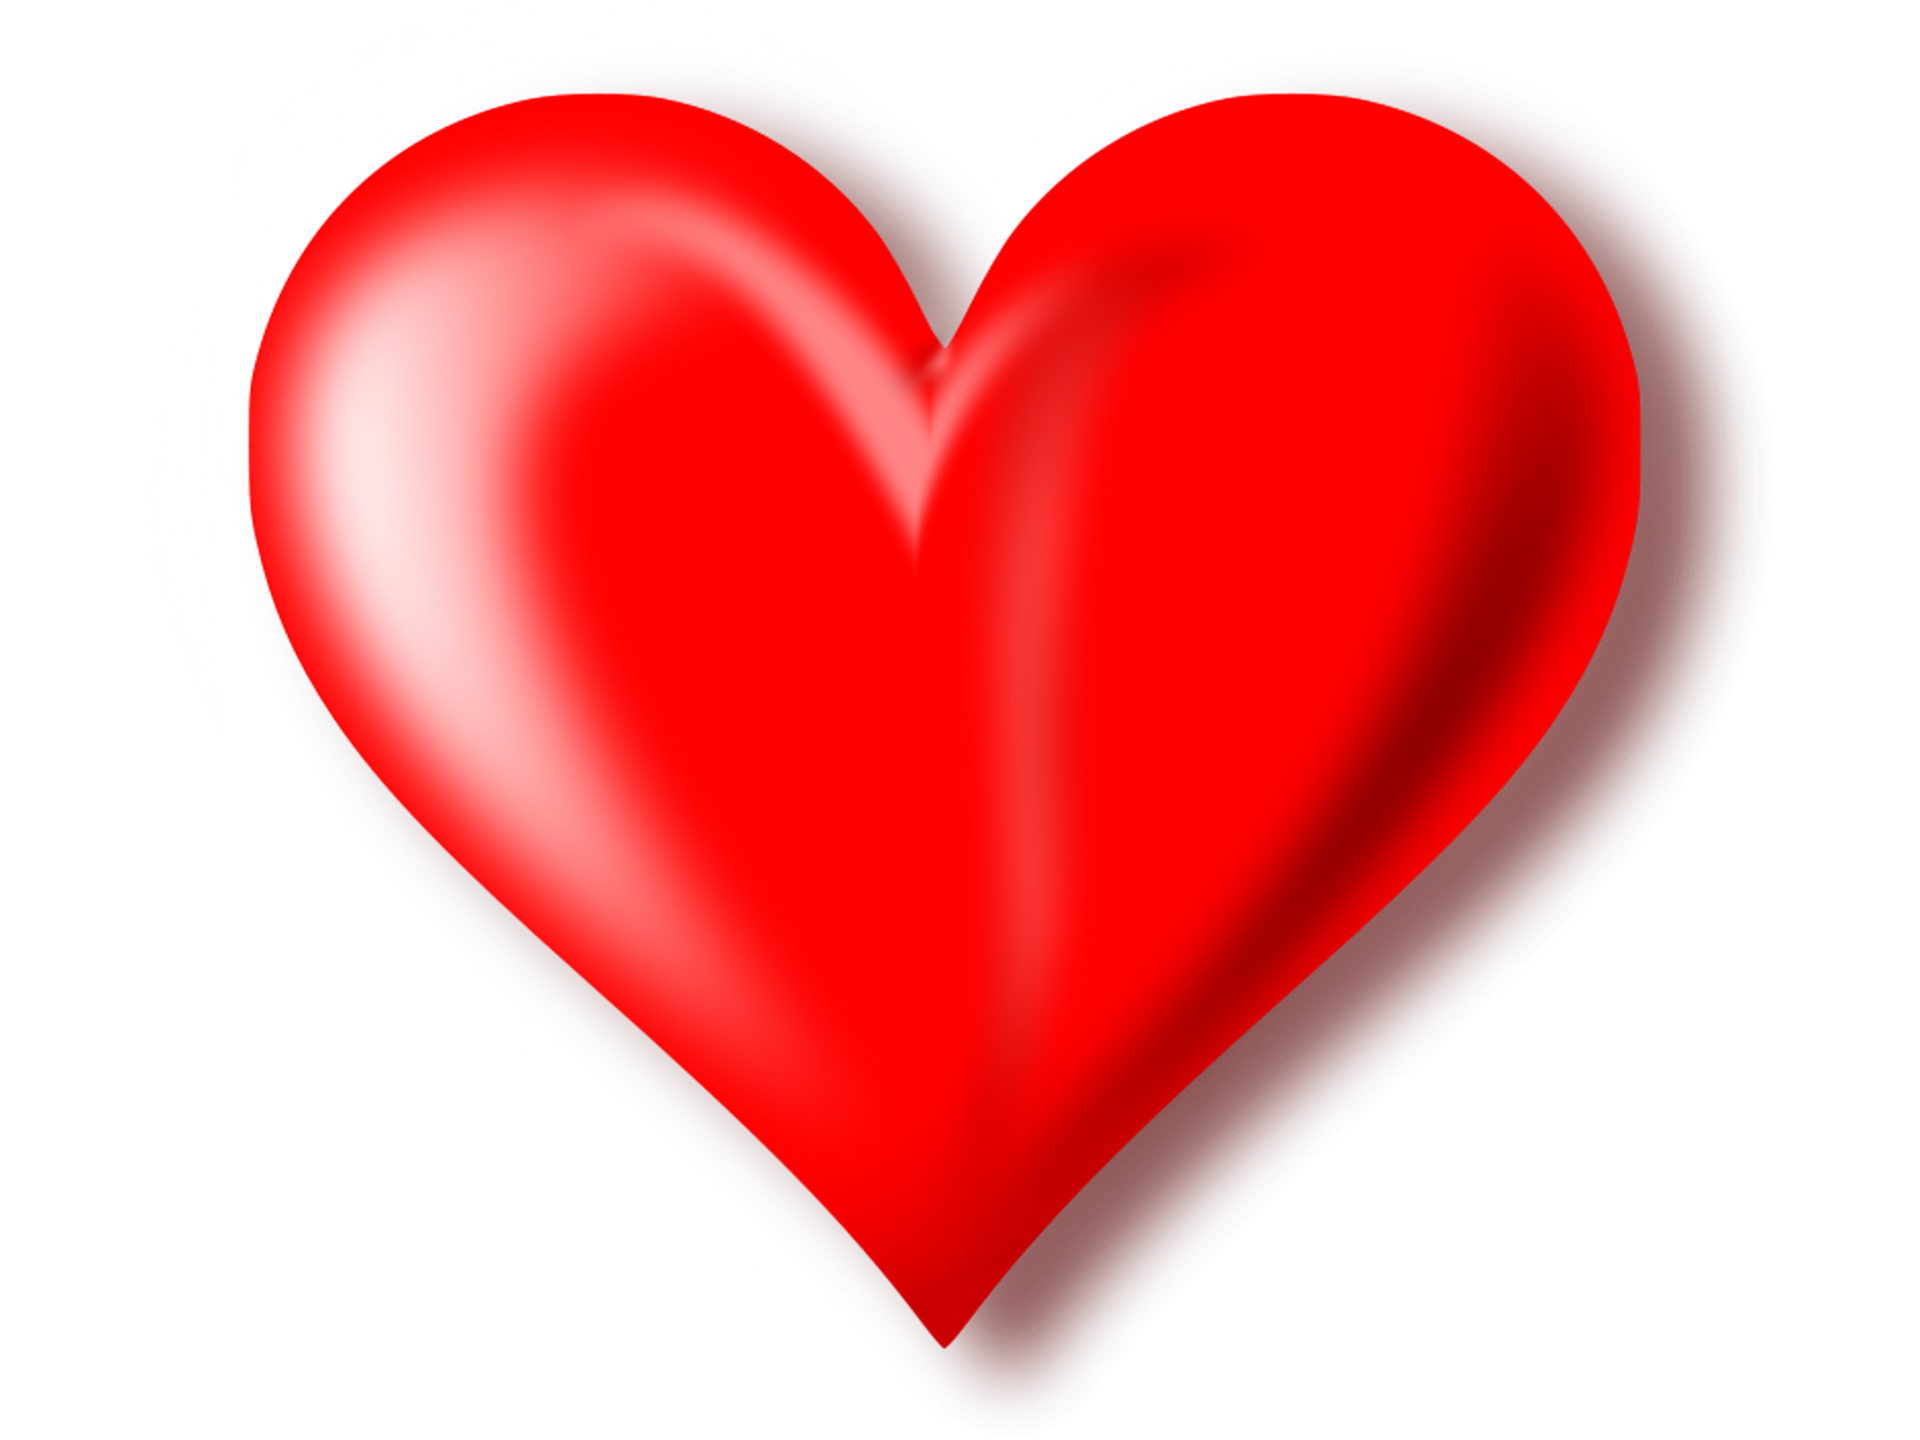 Download-3D-Red-Heart-Transparent-Background